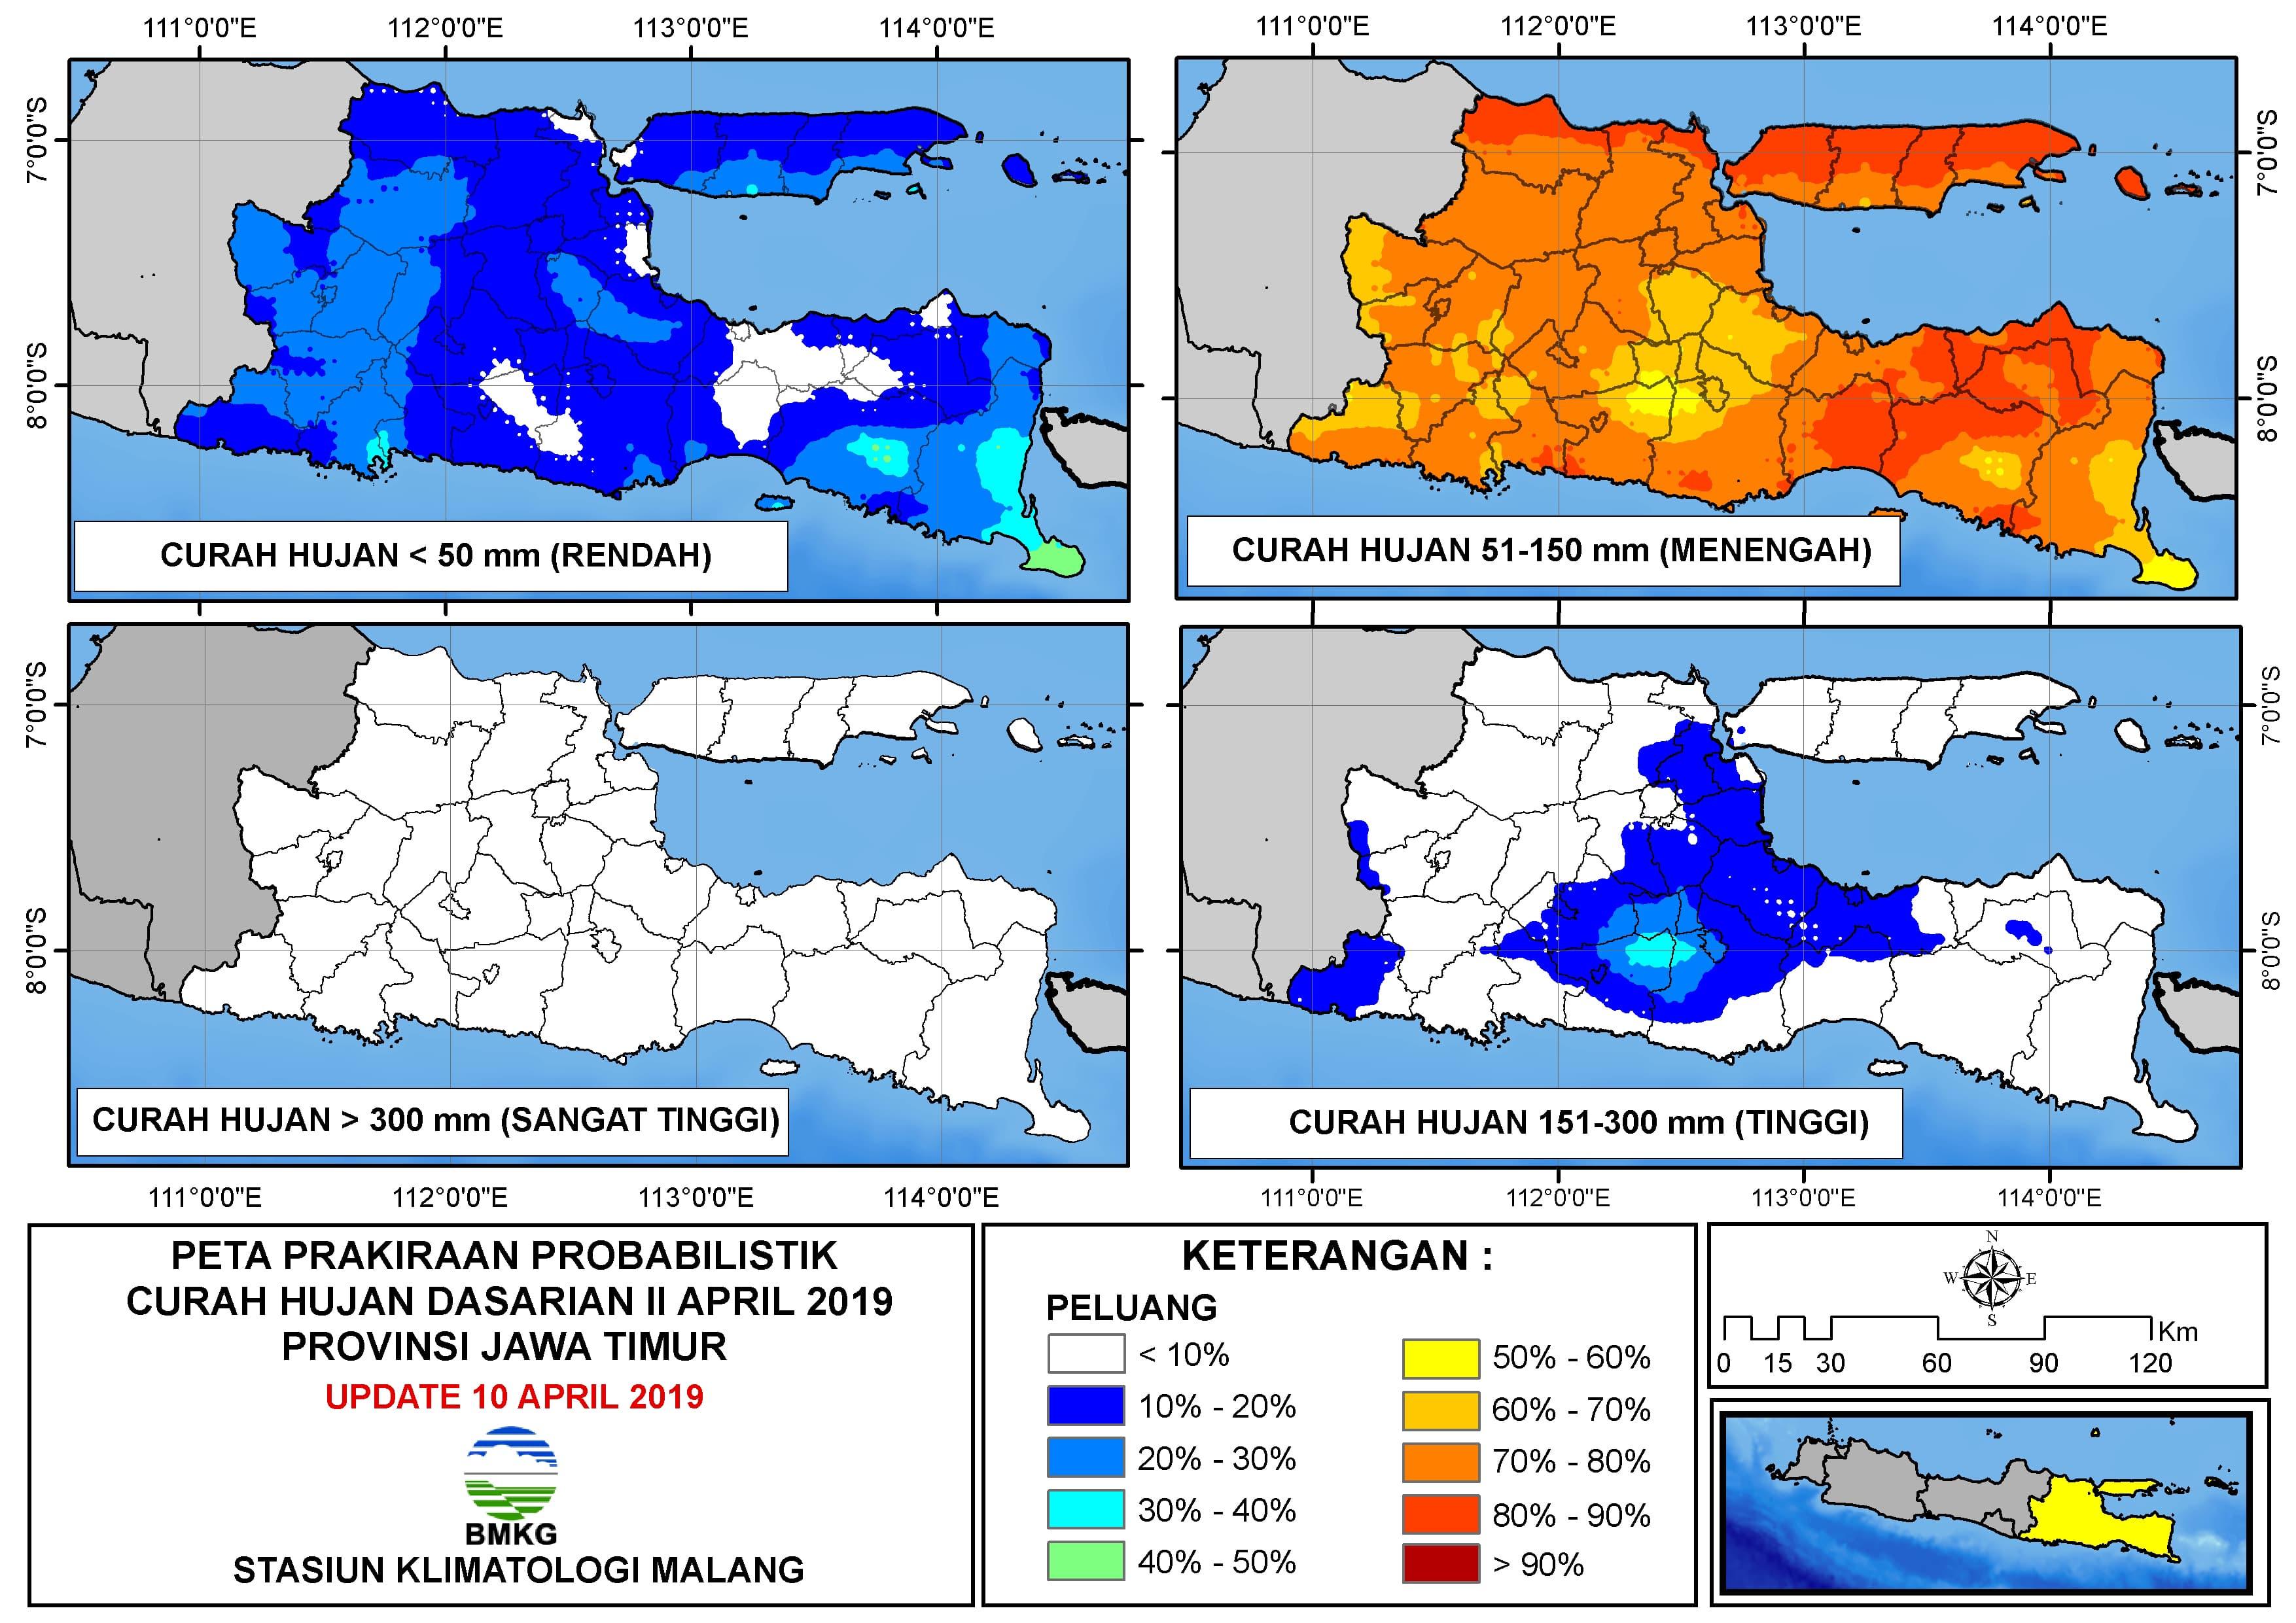 Peta Prakiraan Probabilistik Curah Hujan Dasarian II April 2019 Provinsi Jawa Timur Update 10 April 2019